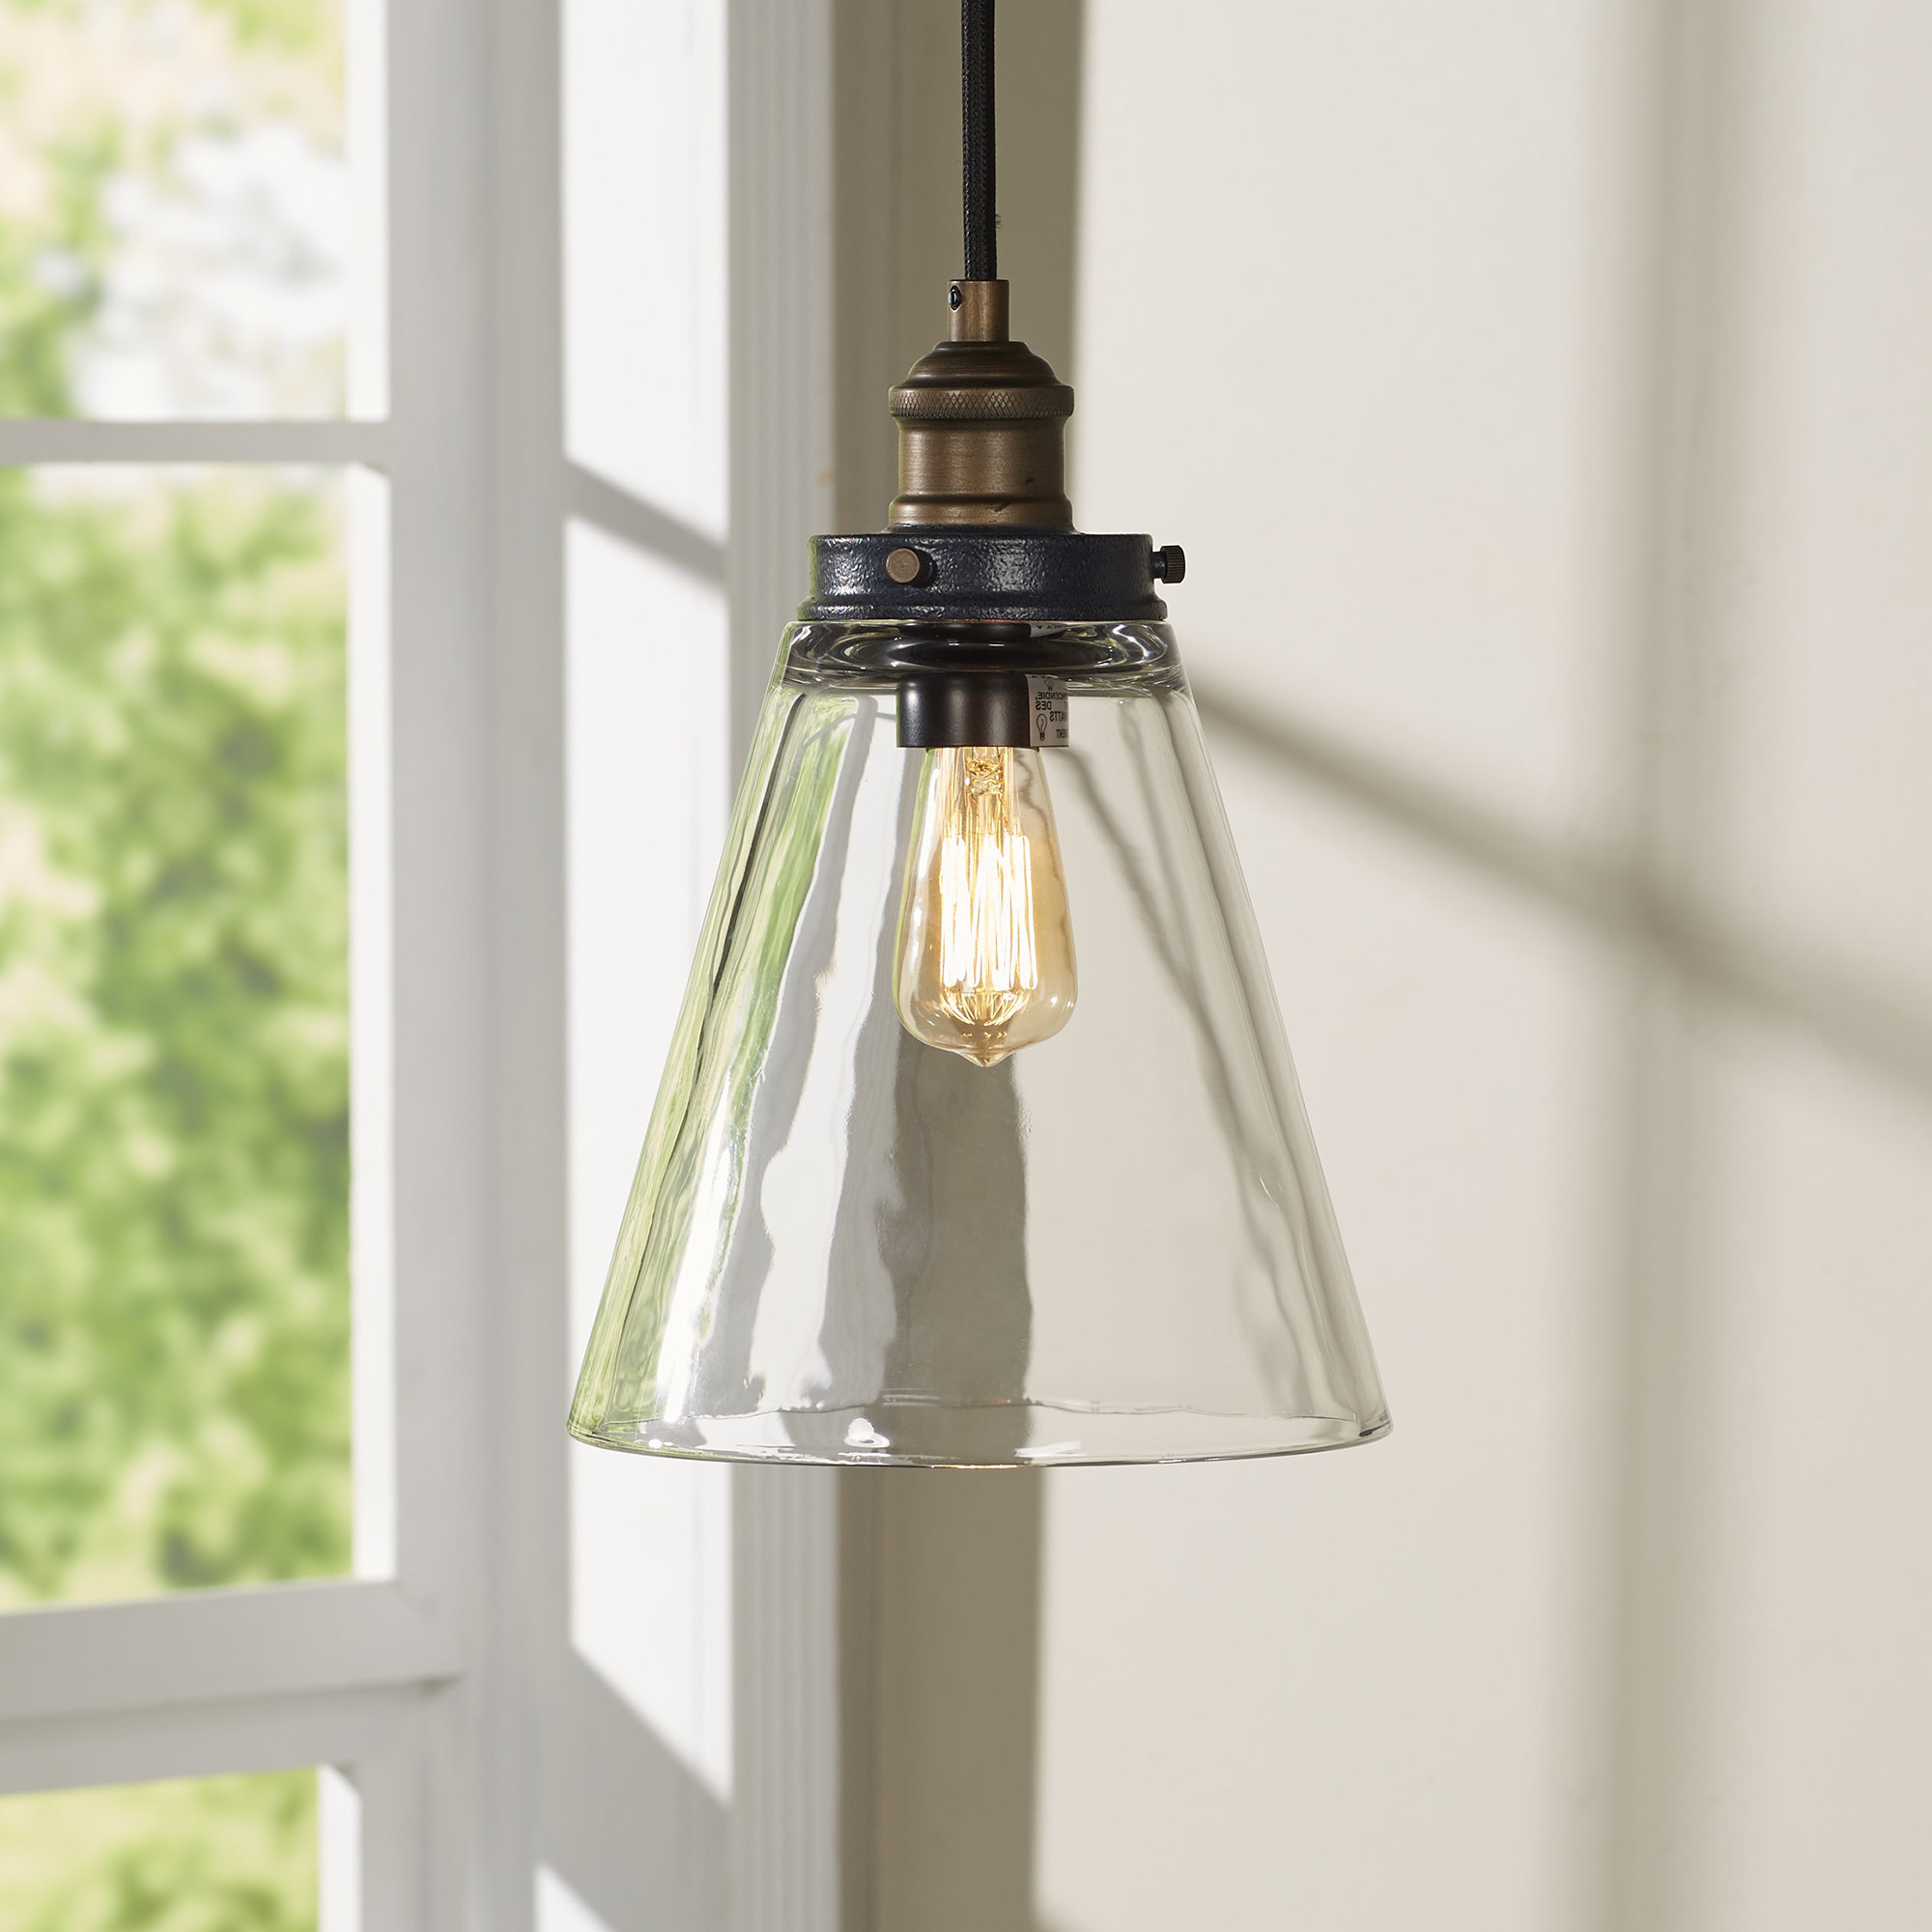 2019 Akakios 1 Light Single Bell Pendants Pertaining To Bedford 1 Light Bell Pendant (View 19 of 25)